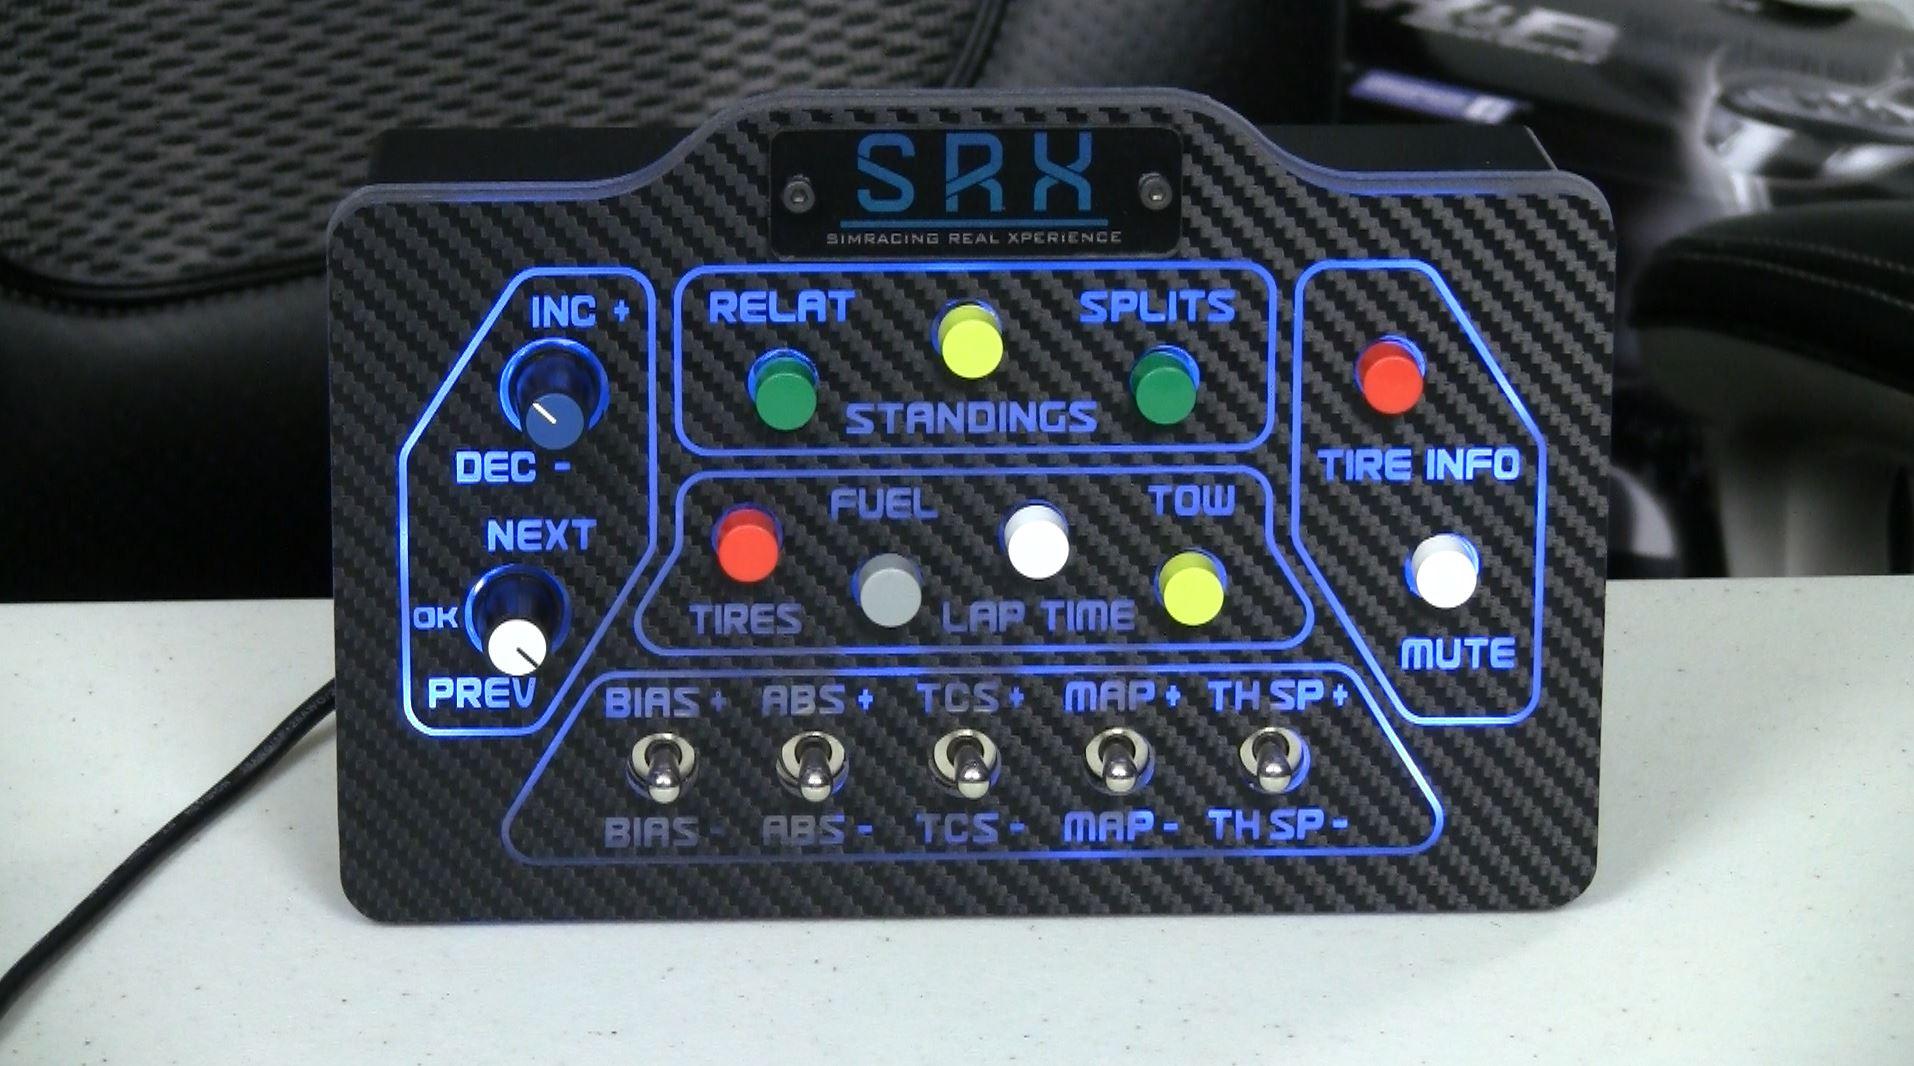 SRX Innobox Pro Button Box Review